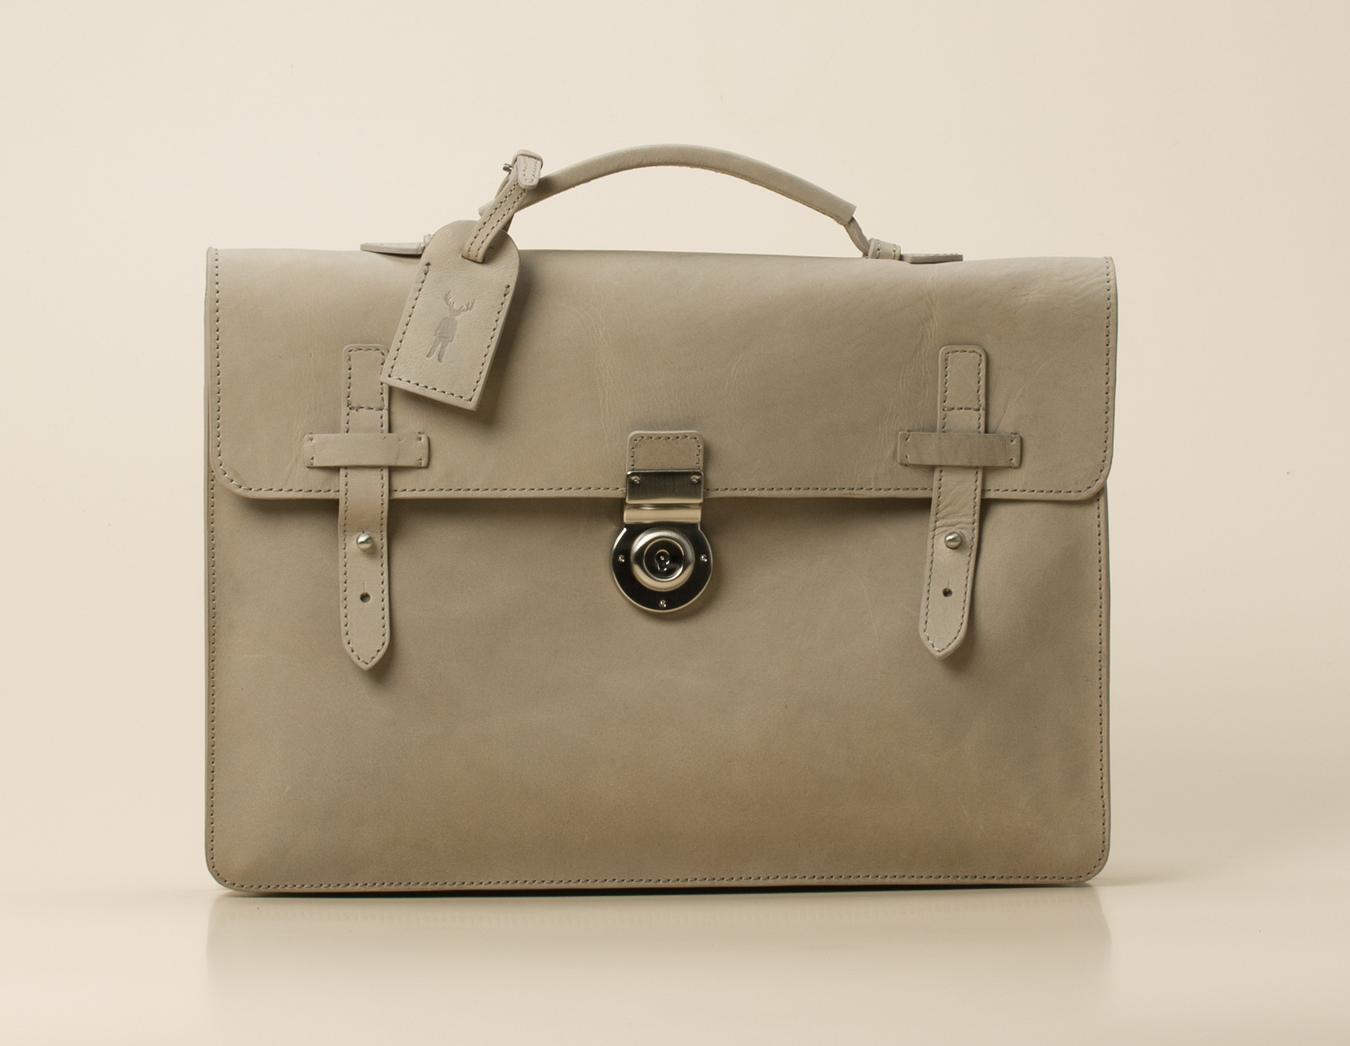 e682e3f3e463d Jack Kinsky Damen-Acces. Laptoptasche in grau kaufen